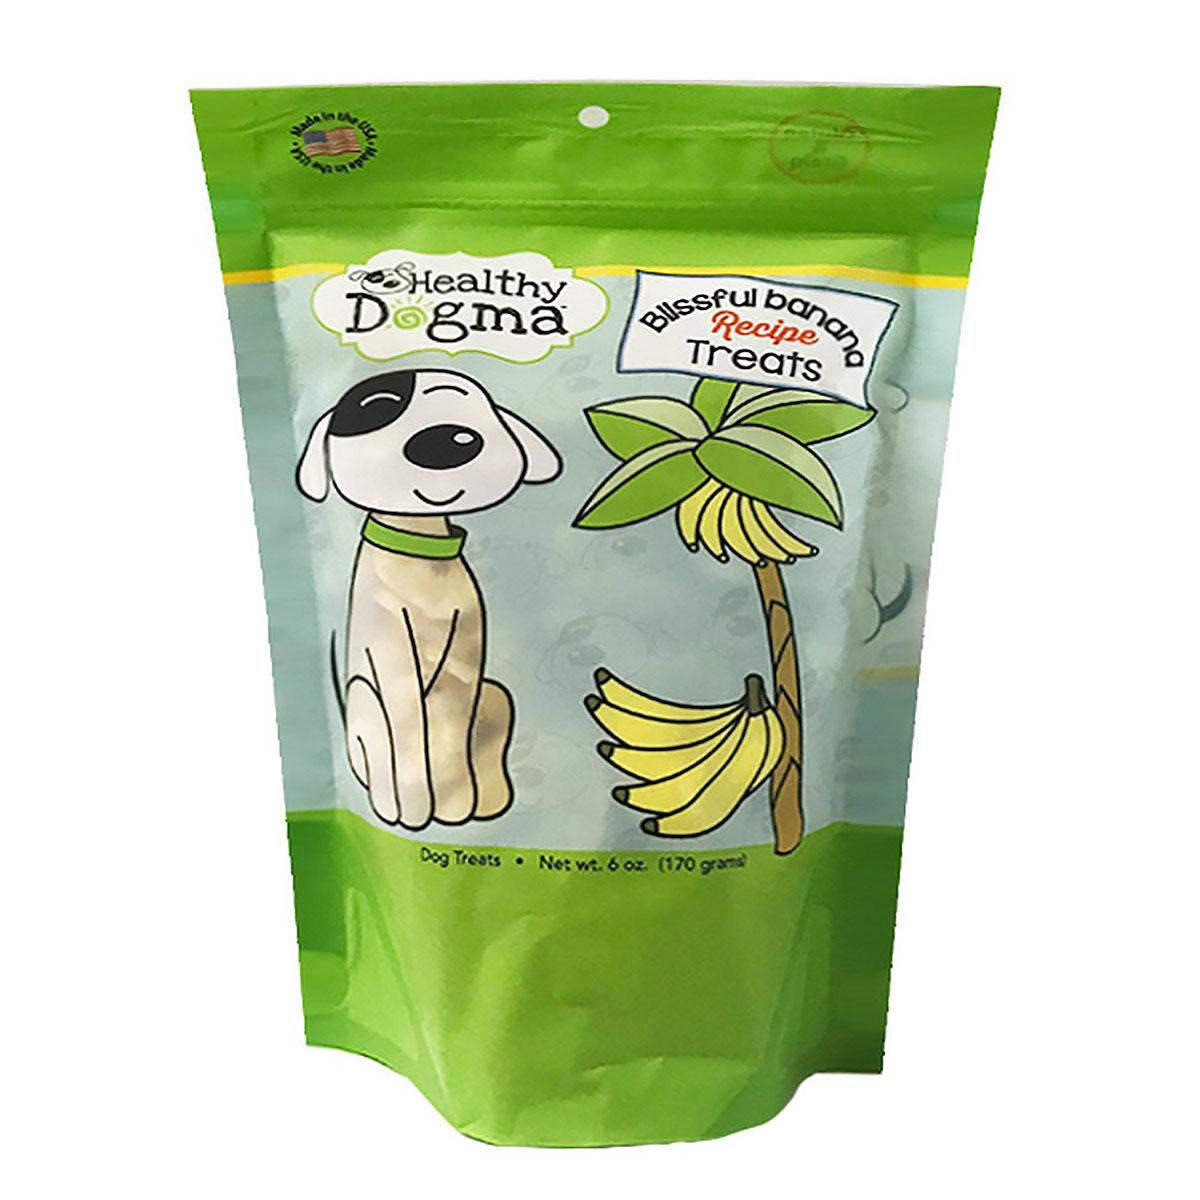 Healthy Dogma Blissful Banana Crisps Dog Treat